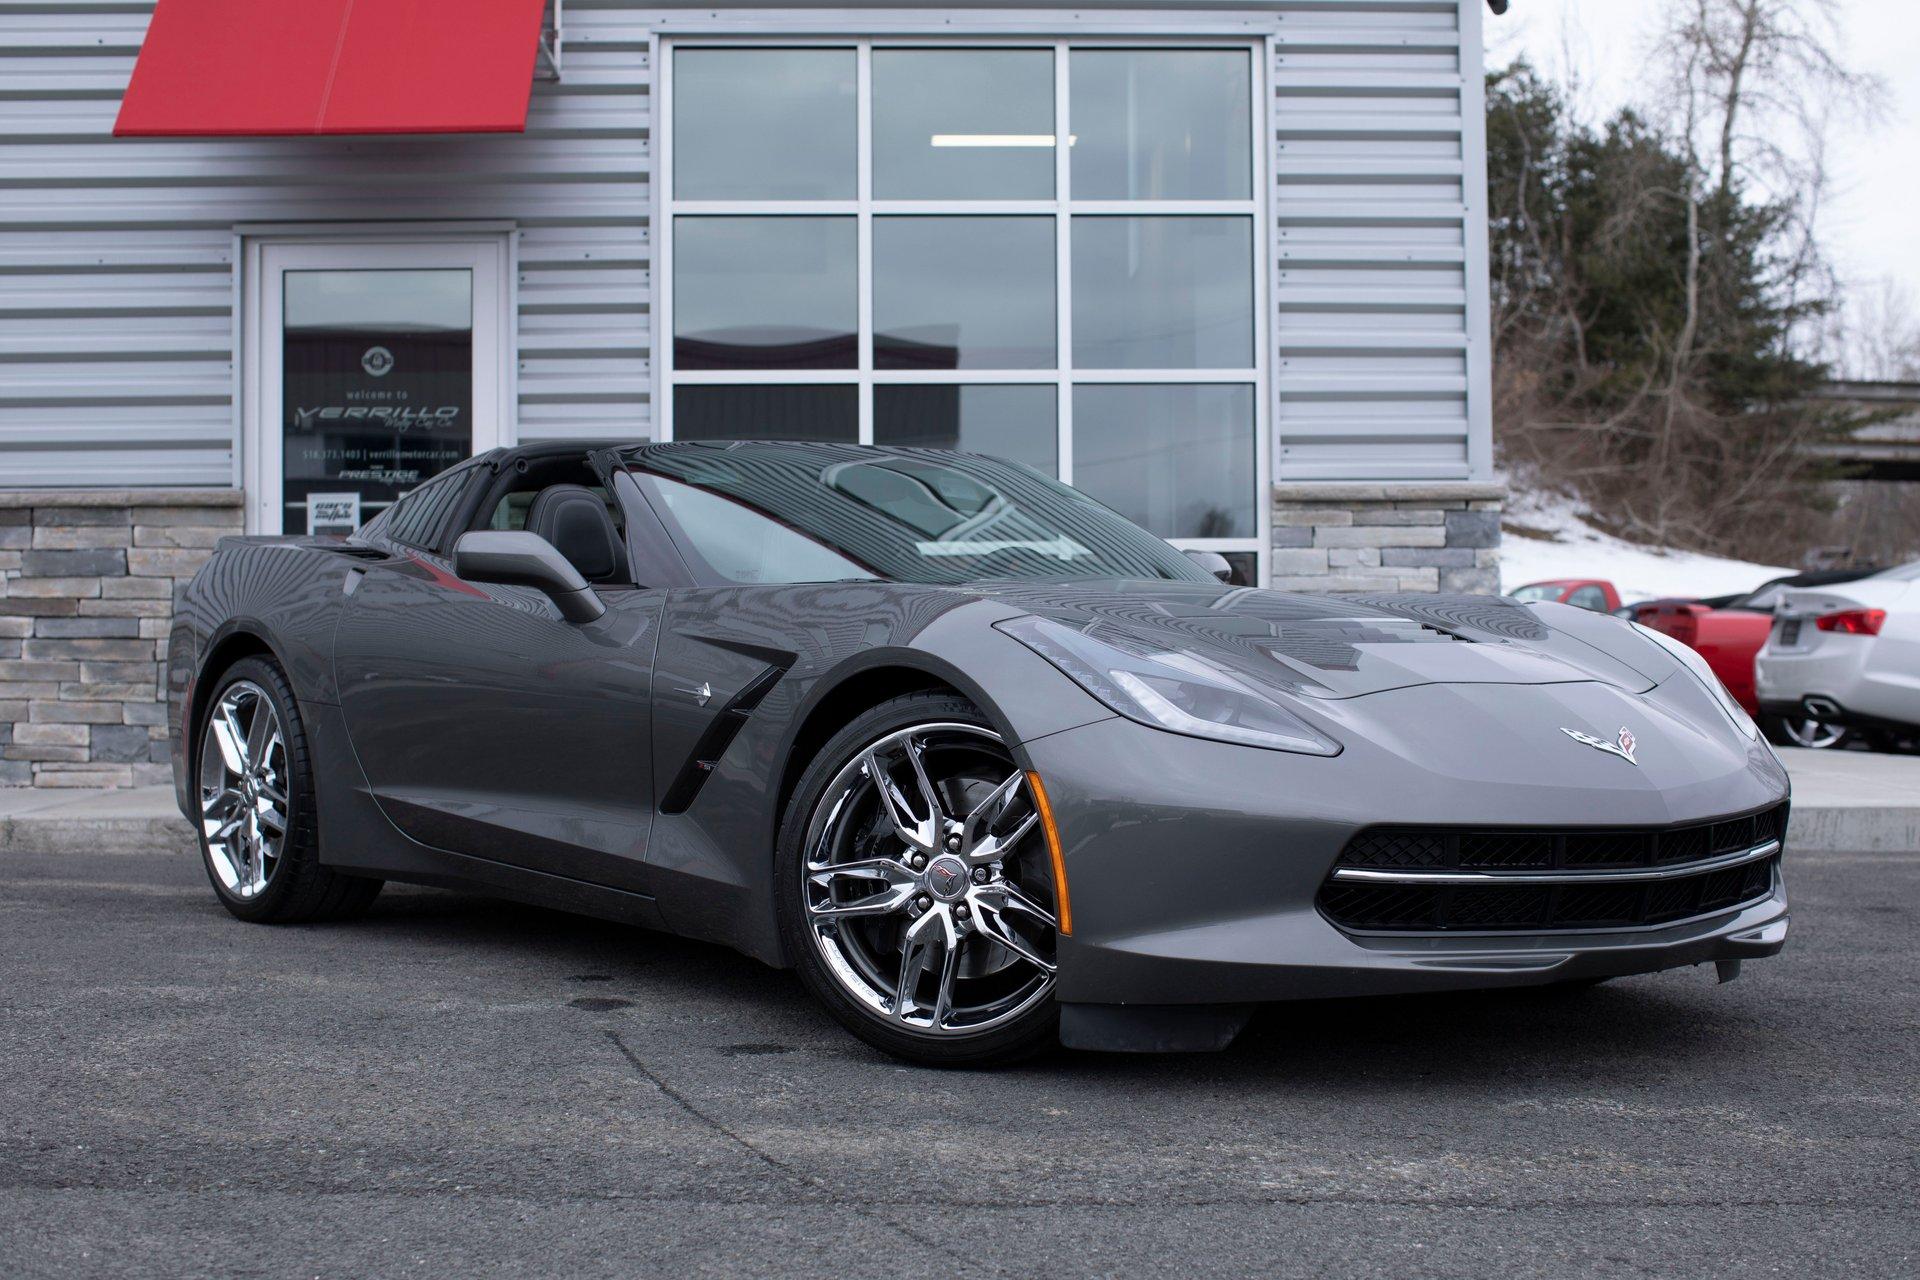 2015 chevrolet corvette 2dr stingray z51 cpe w 3lt